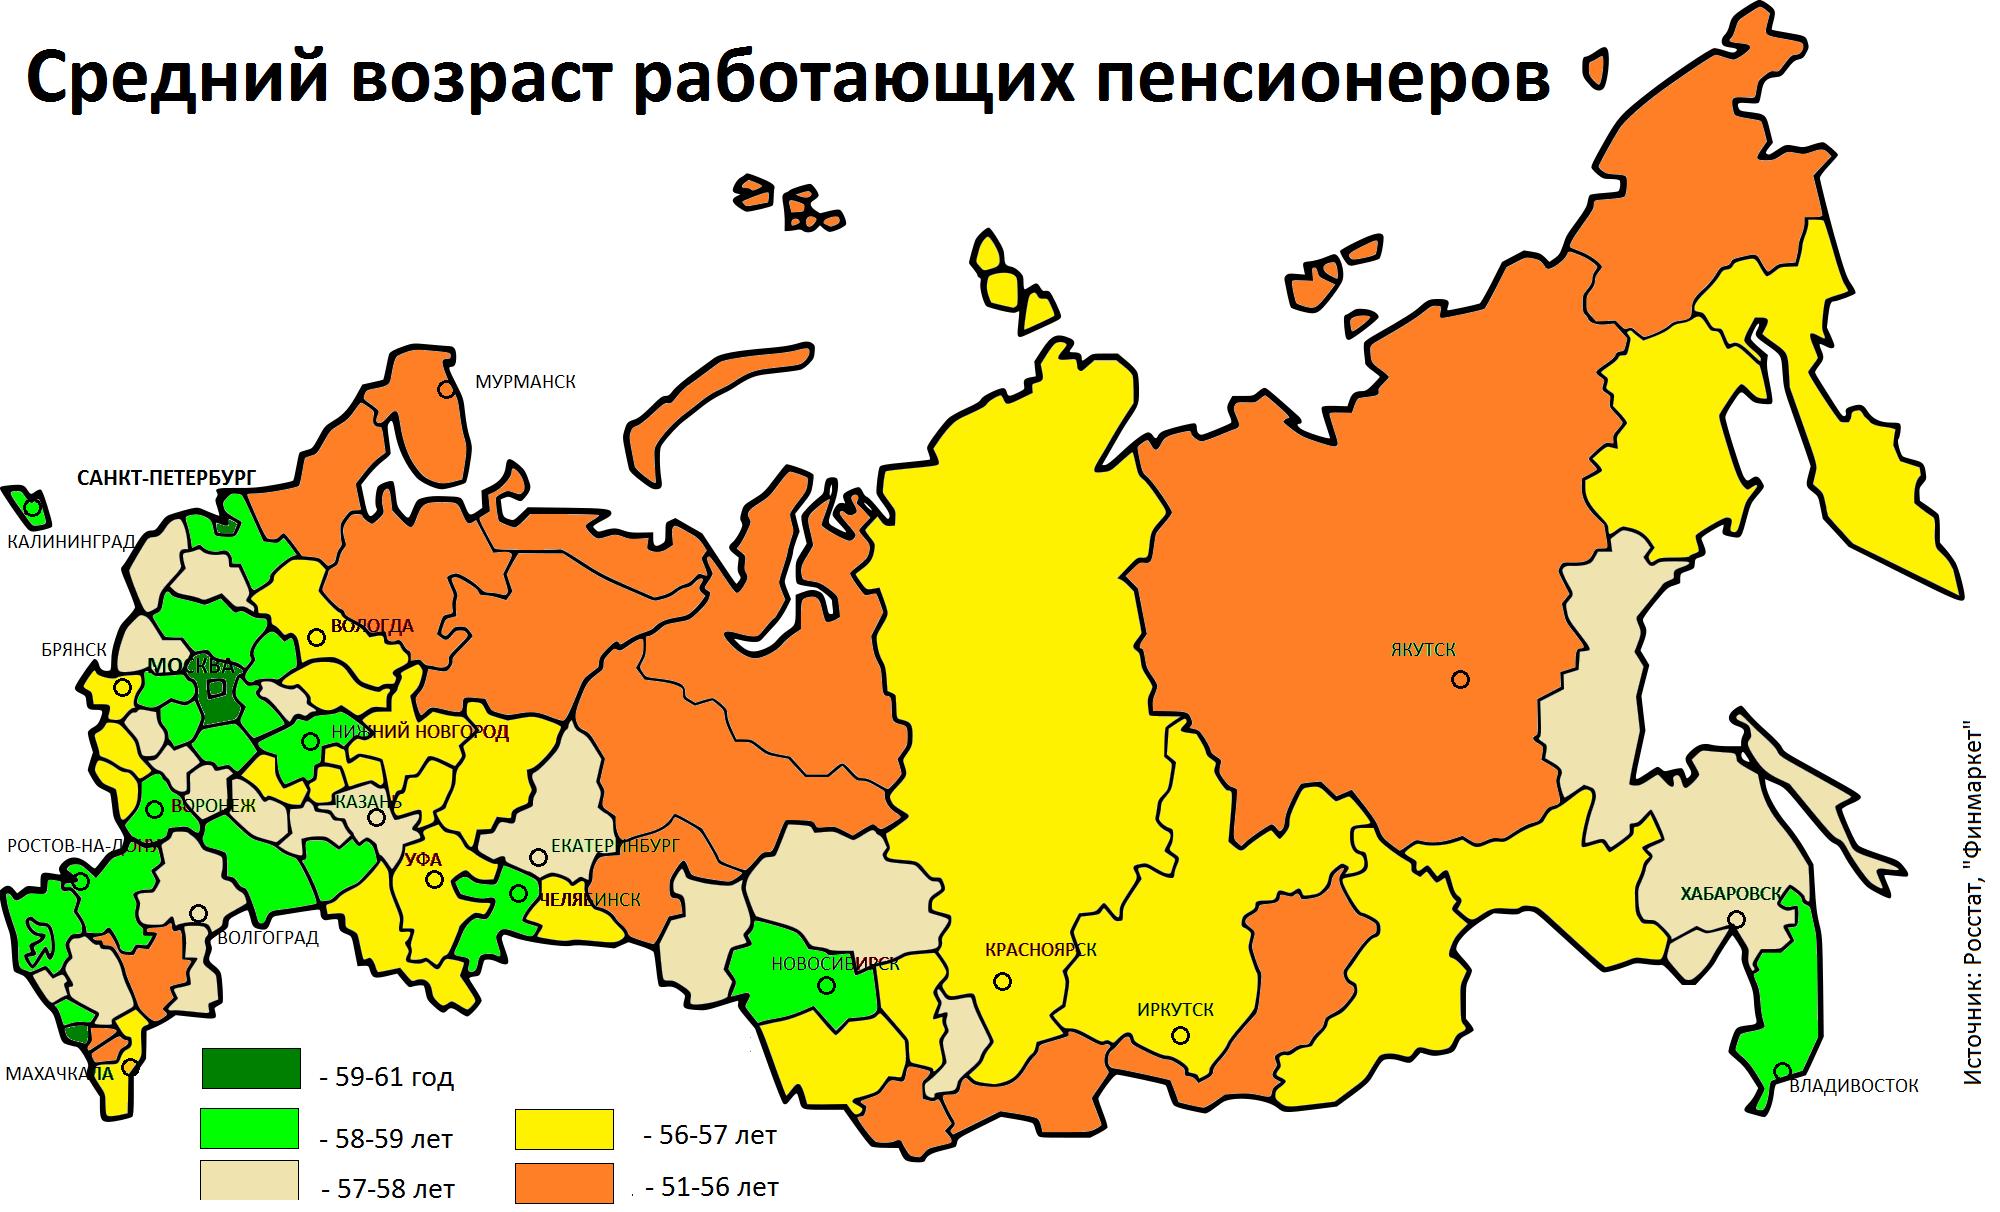 http://fmimg.finmarket.ru/FMCharts/180313/pens3.png